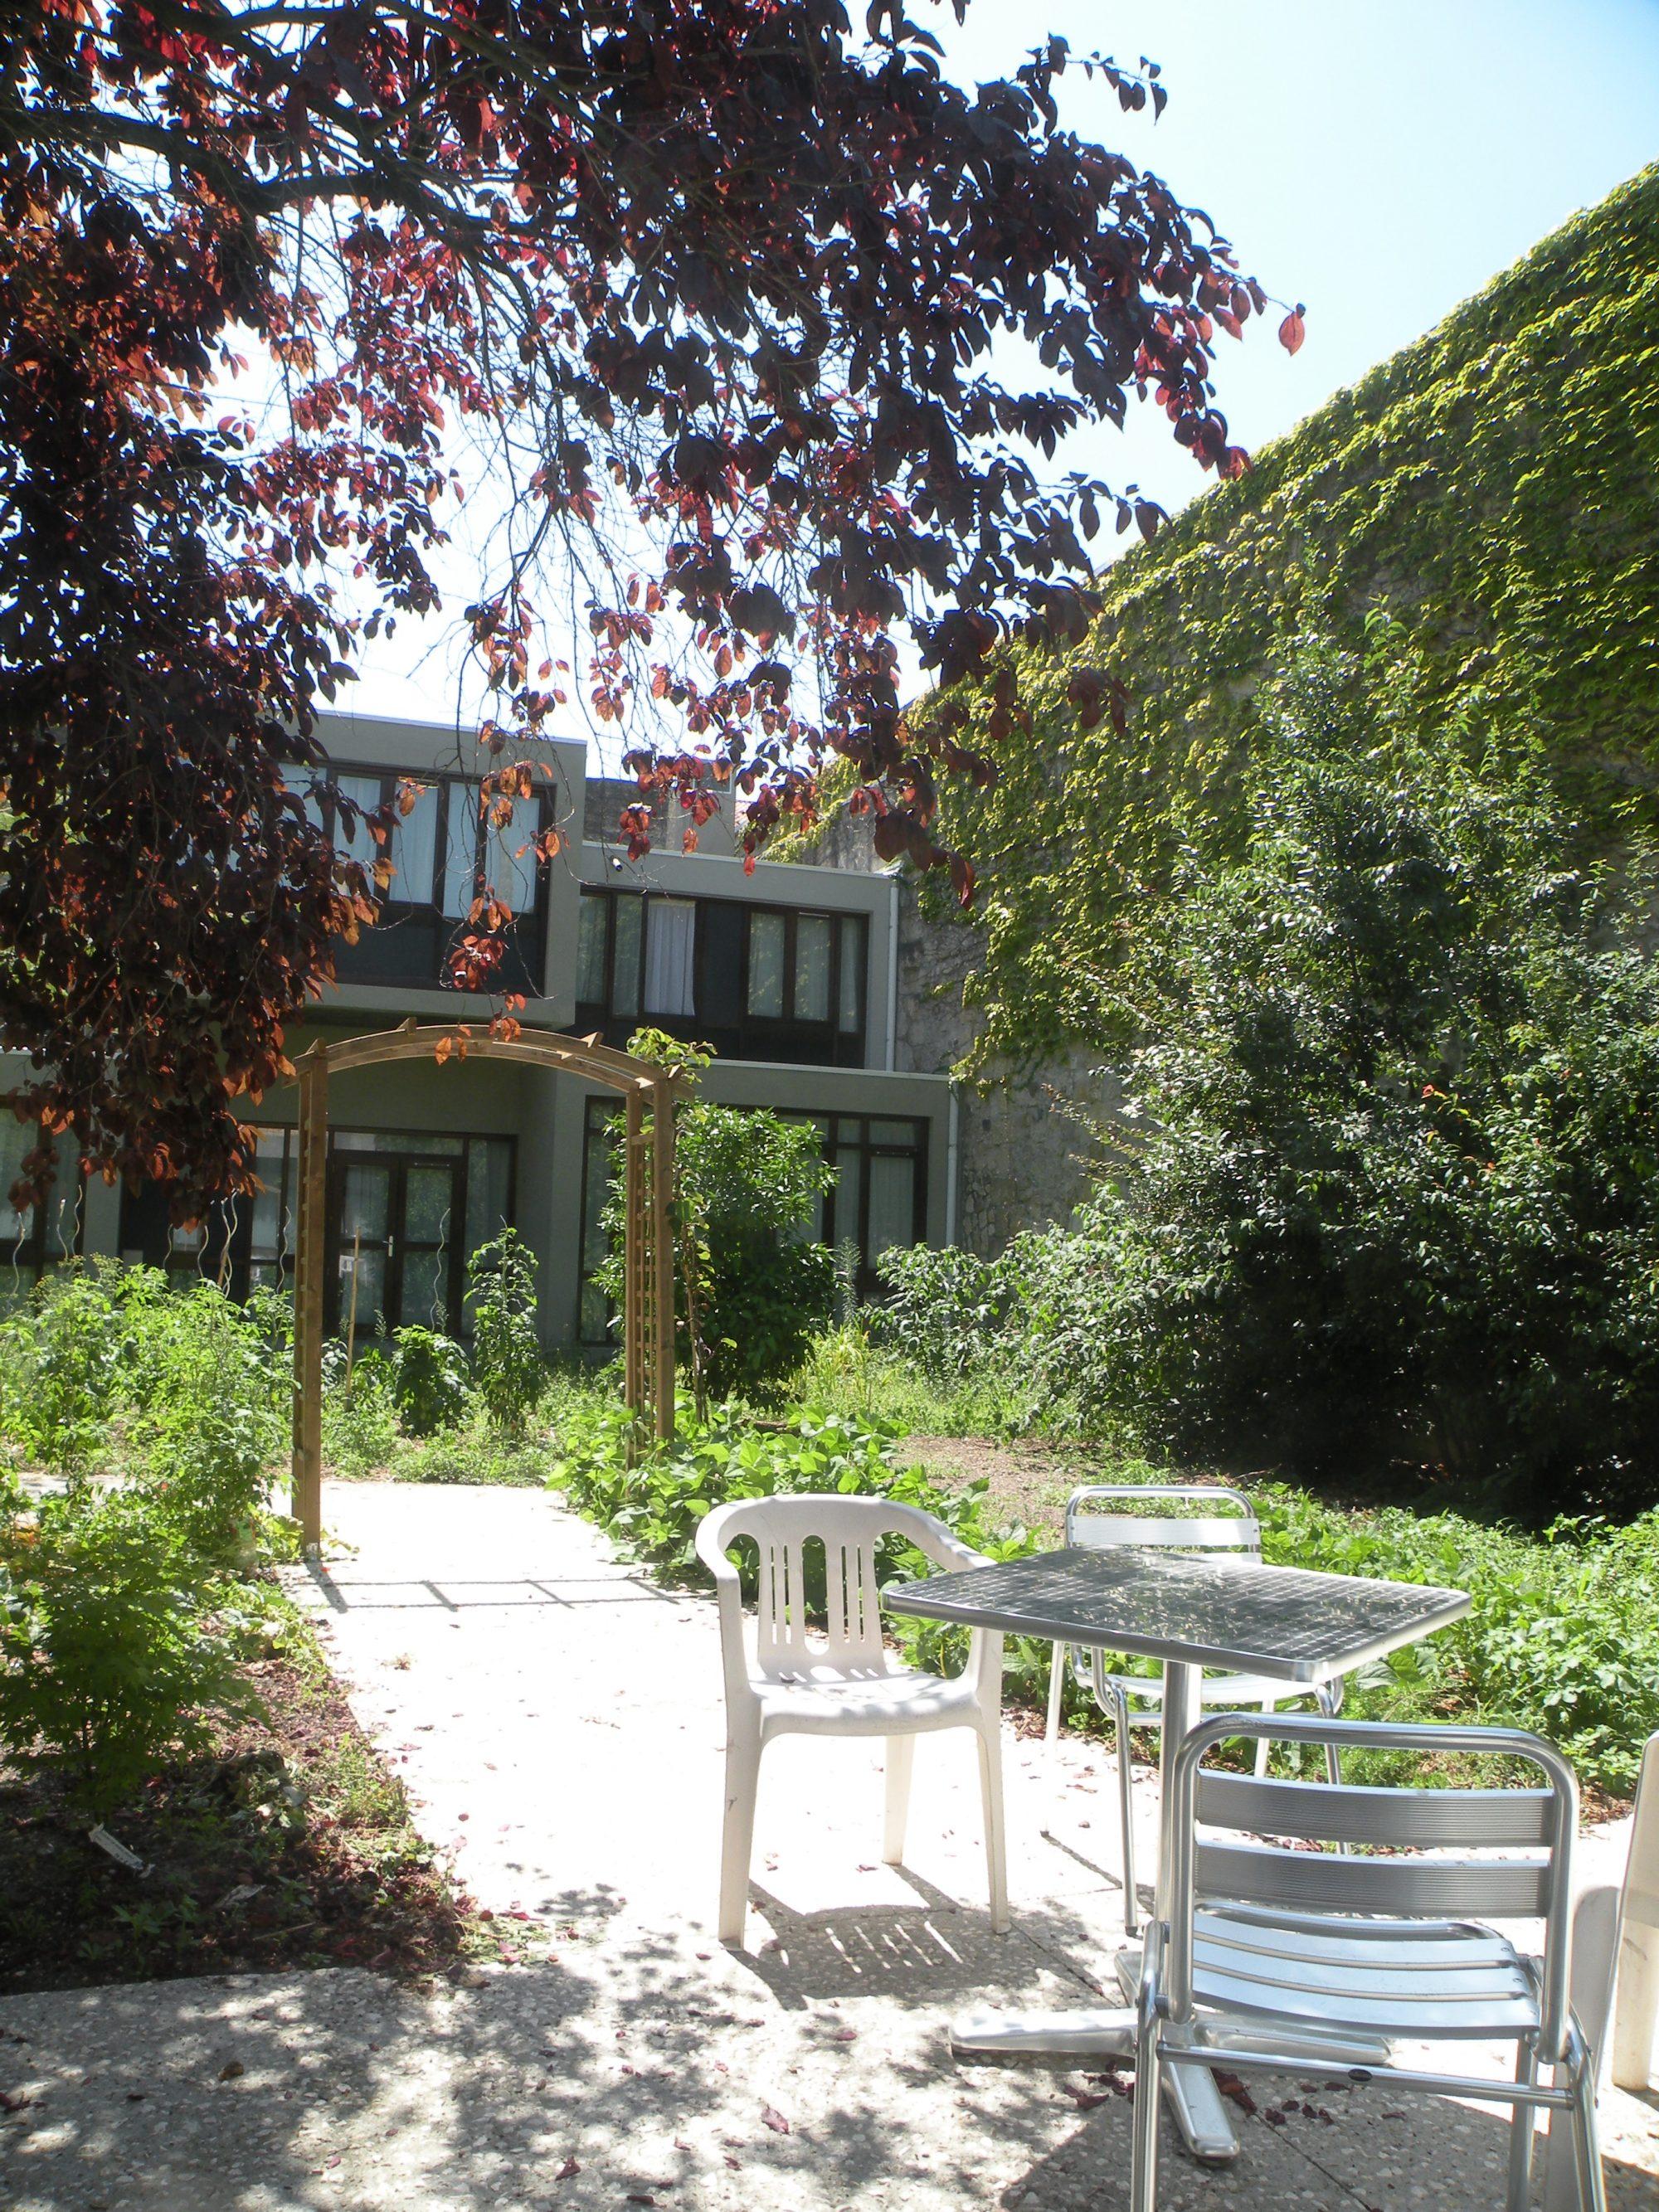 Le jardin de la résidence Rosa-Parks@Habitat Jeunes L'Eveil